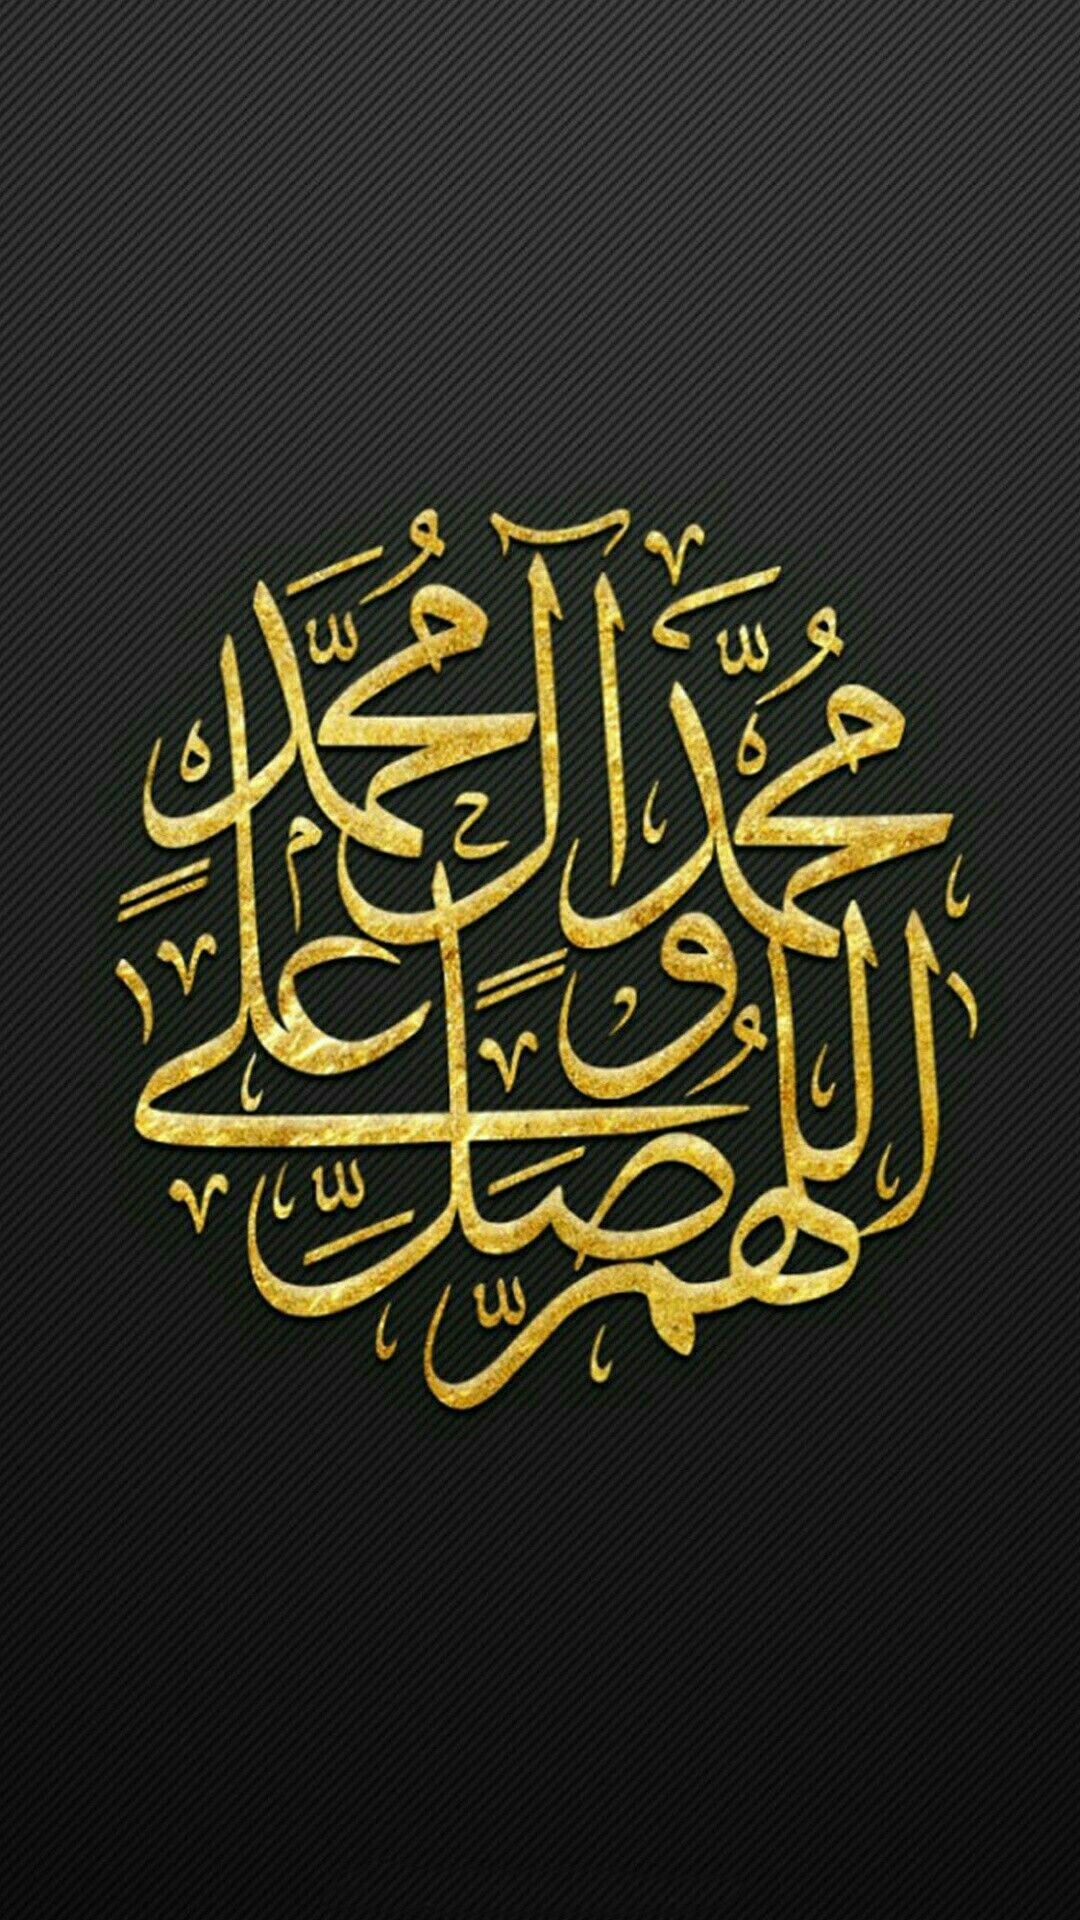 Исламский картинки с надписями арабскими